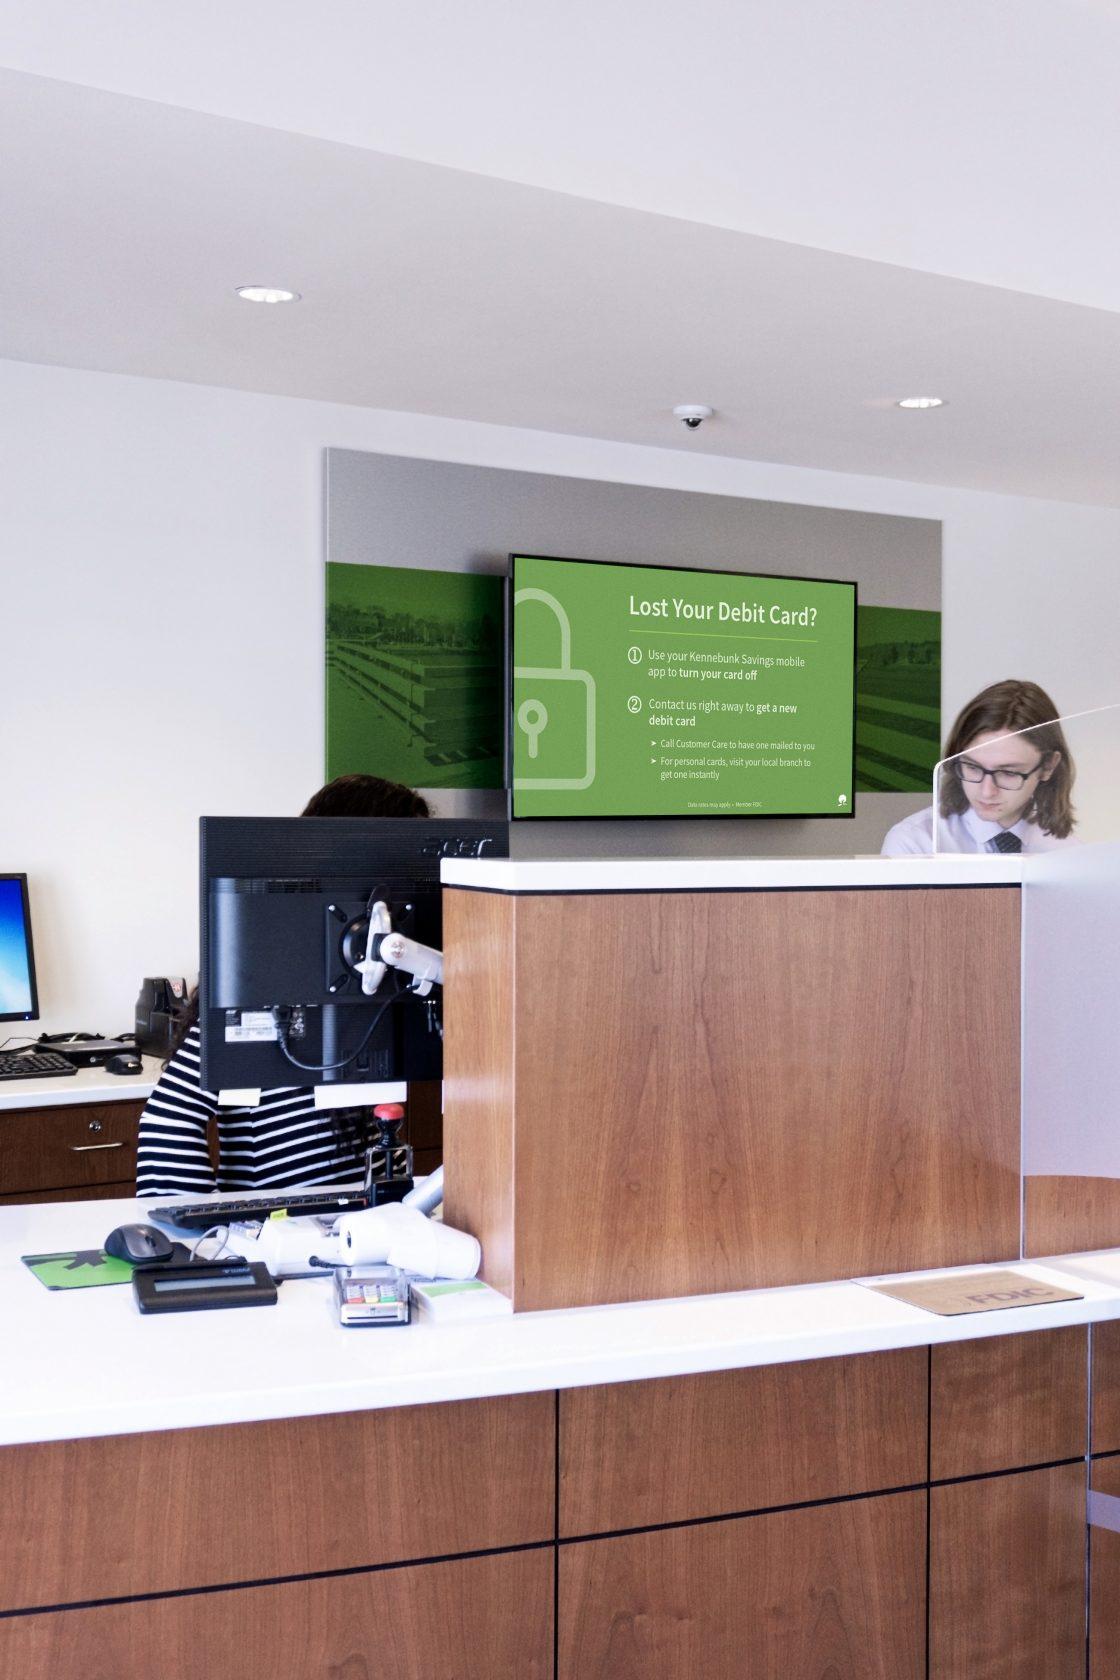 Digital displays convey relevant, local information behind a bank teller line